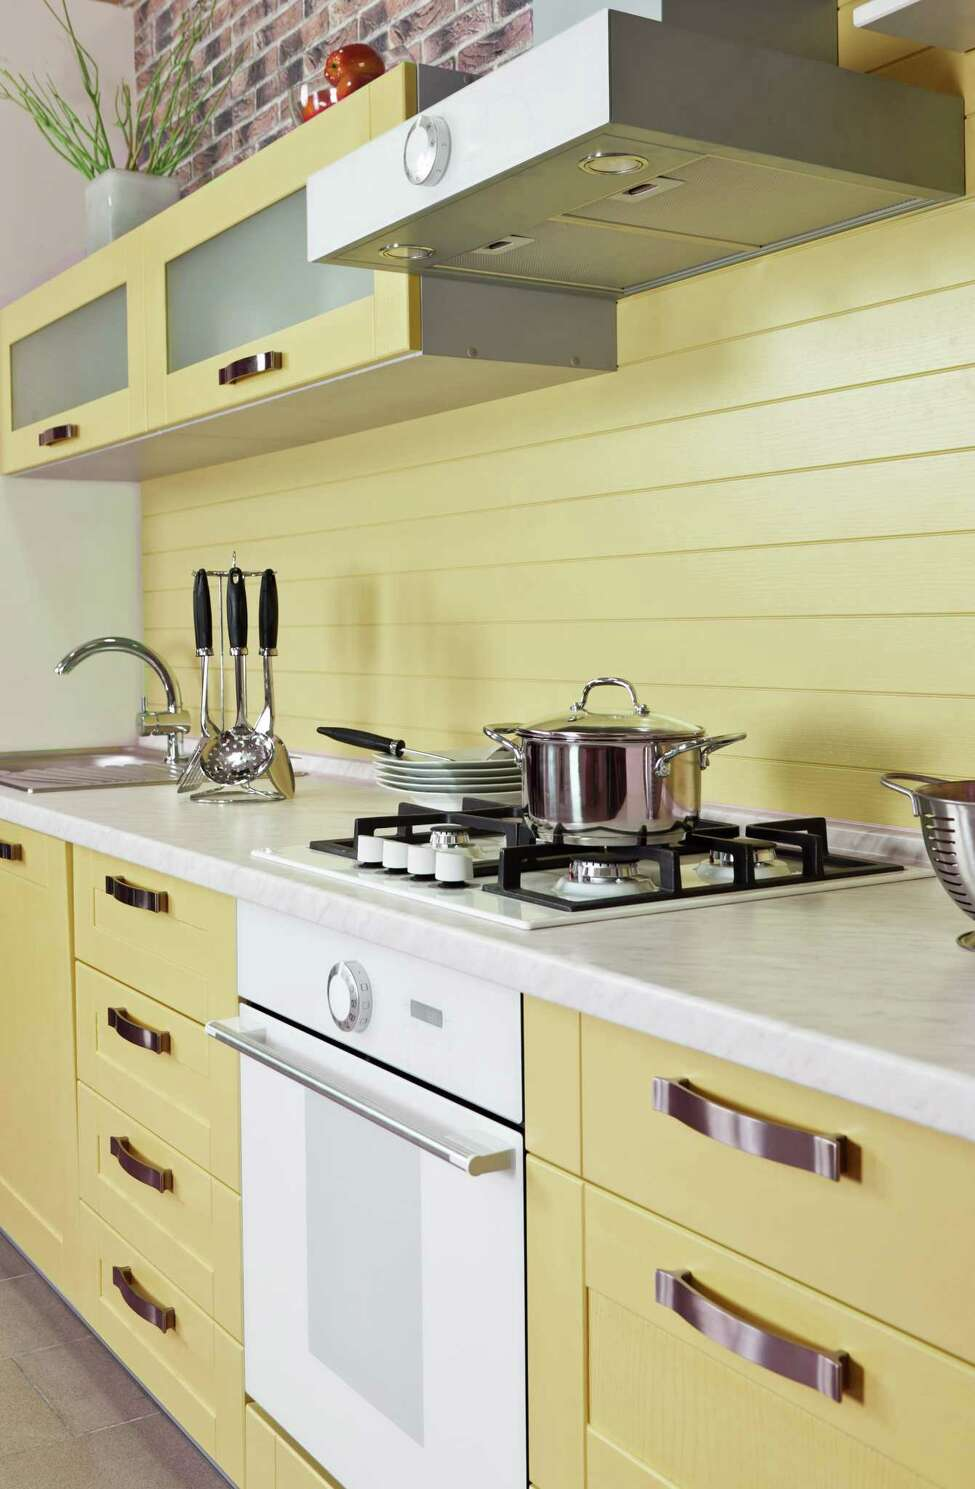 Goodbye white kitchen, hello colors.